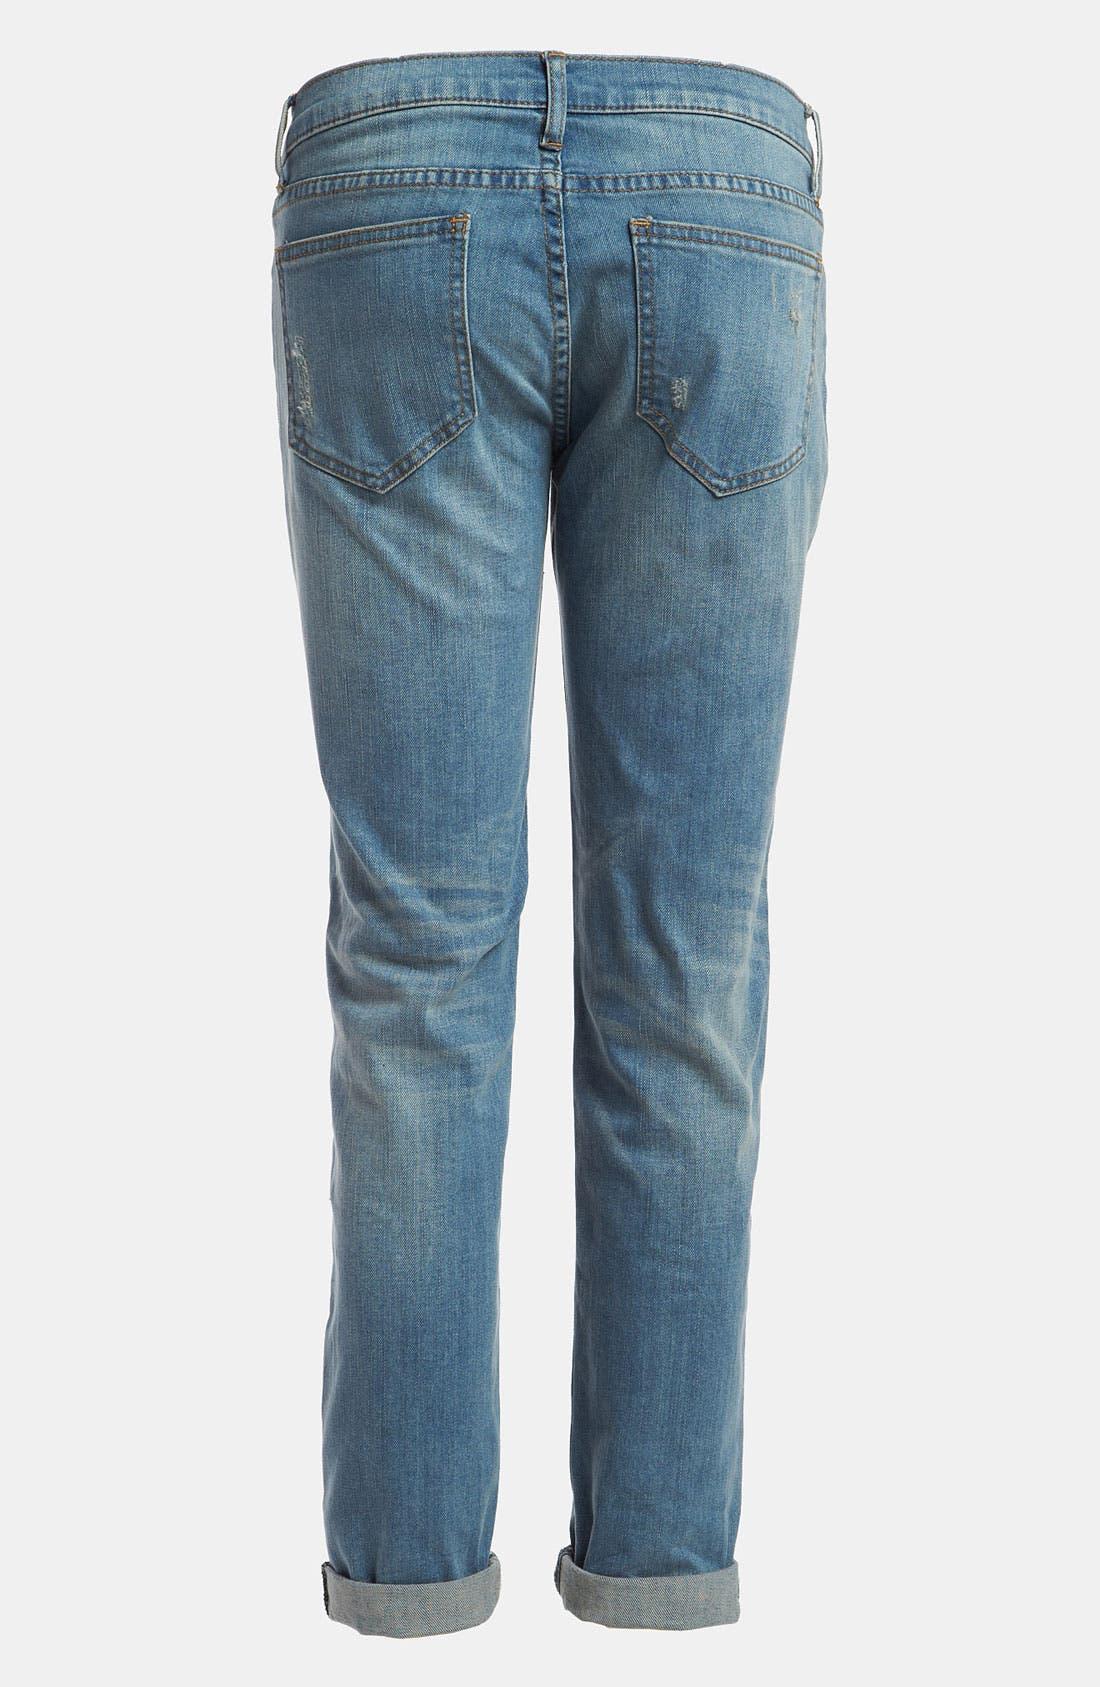 EDYSON,                             'Soho' Relaxed Boyfriend Jeans,                             Alternate thumbnail 2, color,                             400